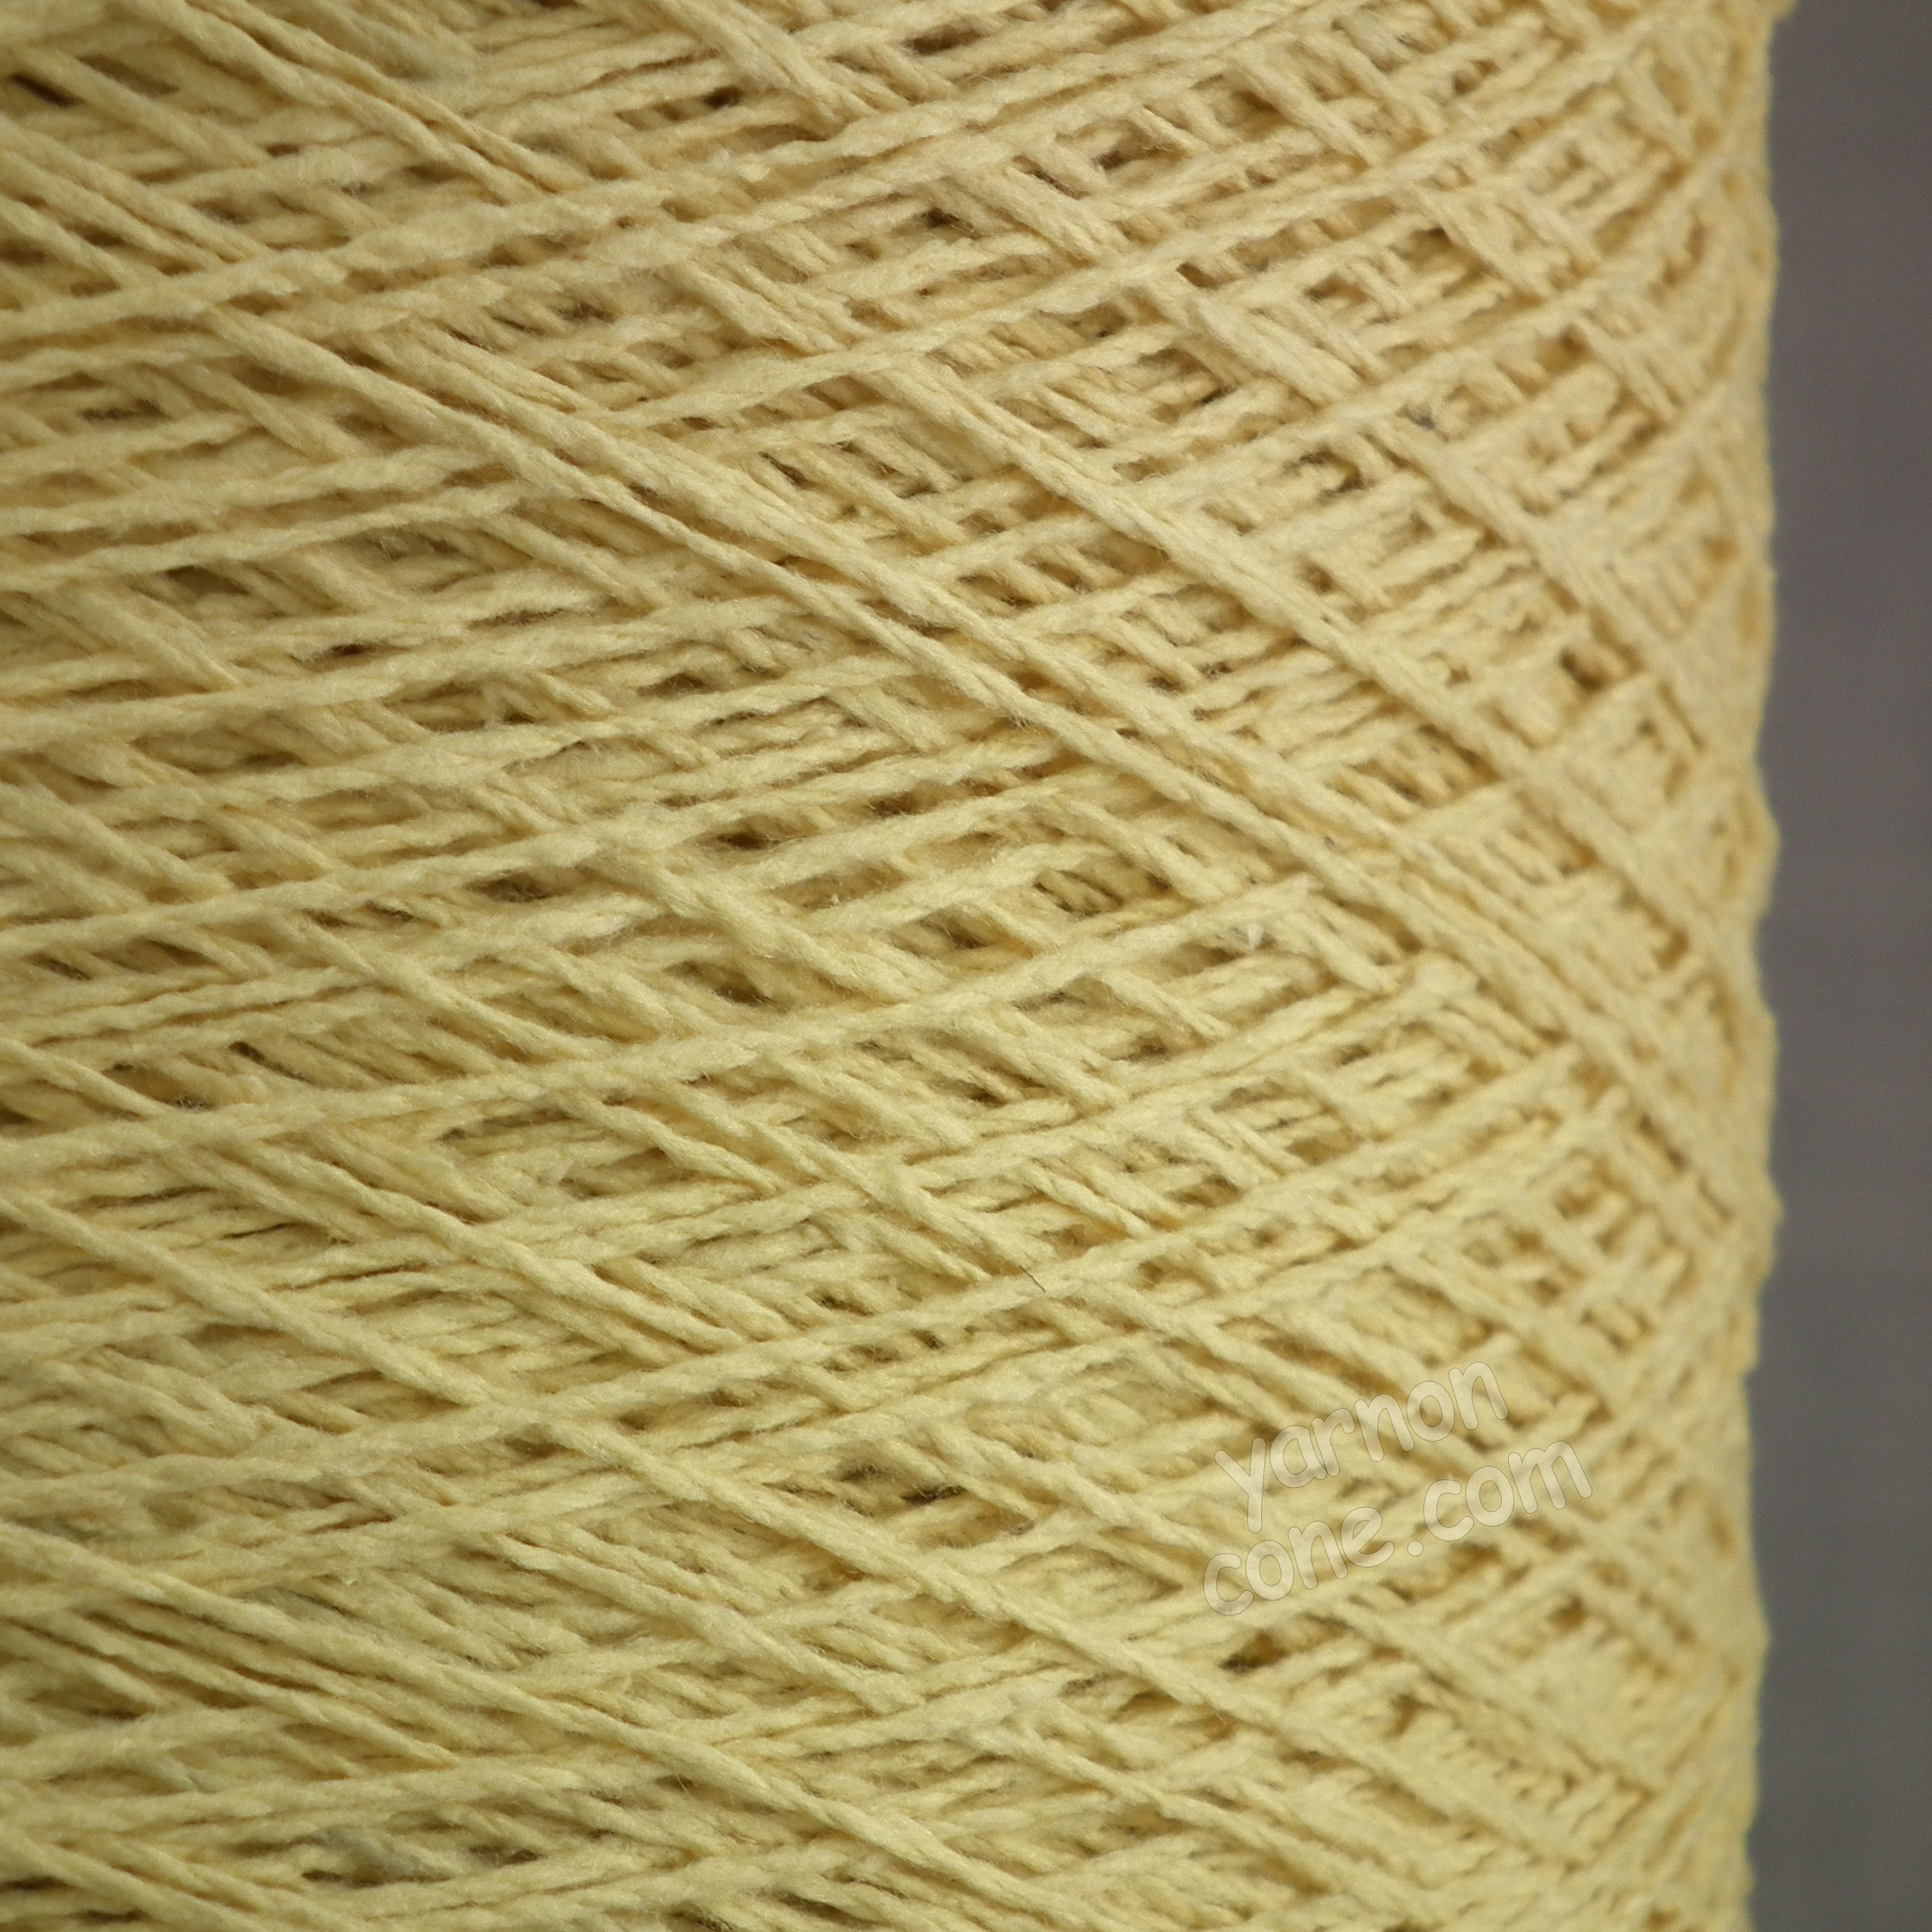 silk noil yarn on cone machine knitting yarn weaving rustic pure yellow